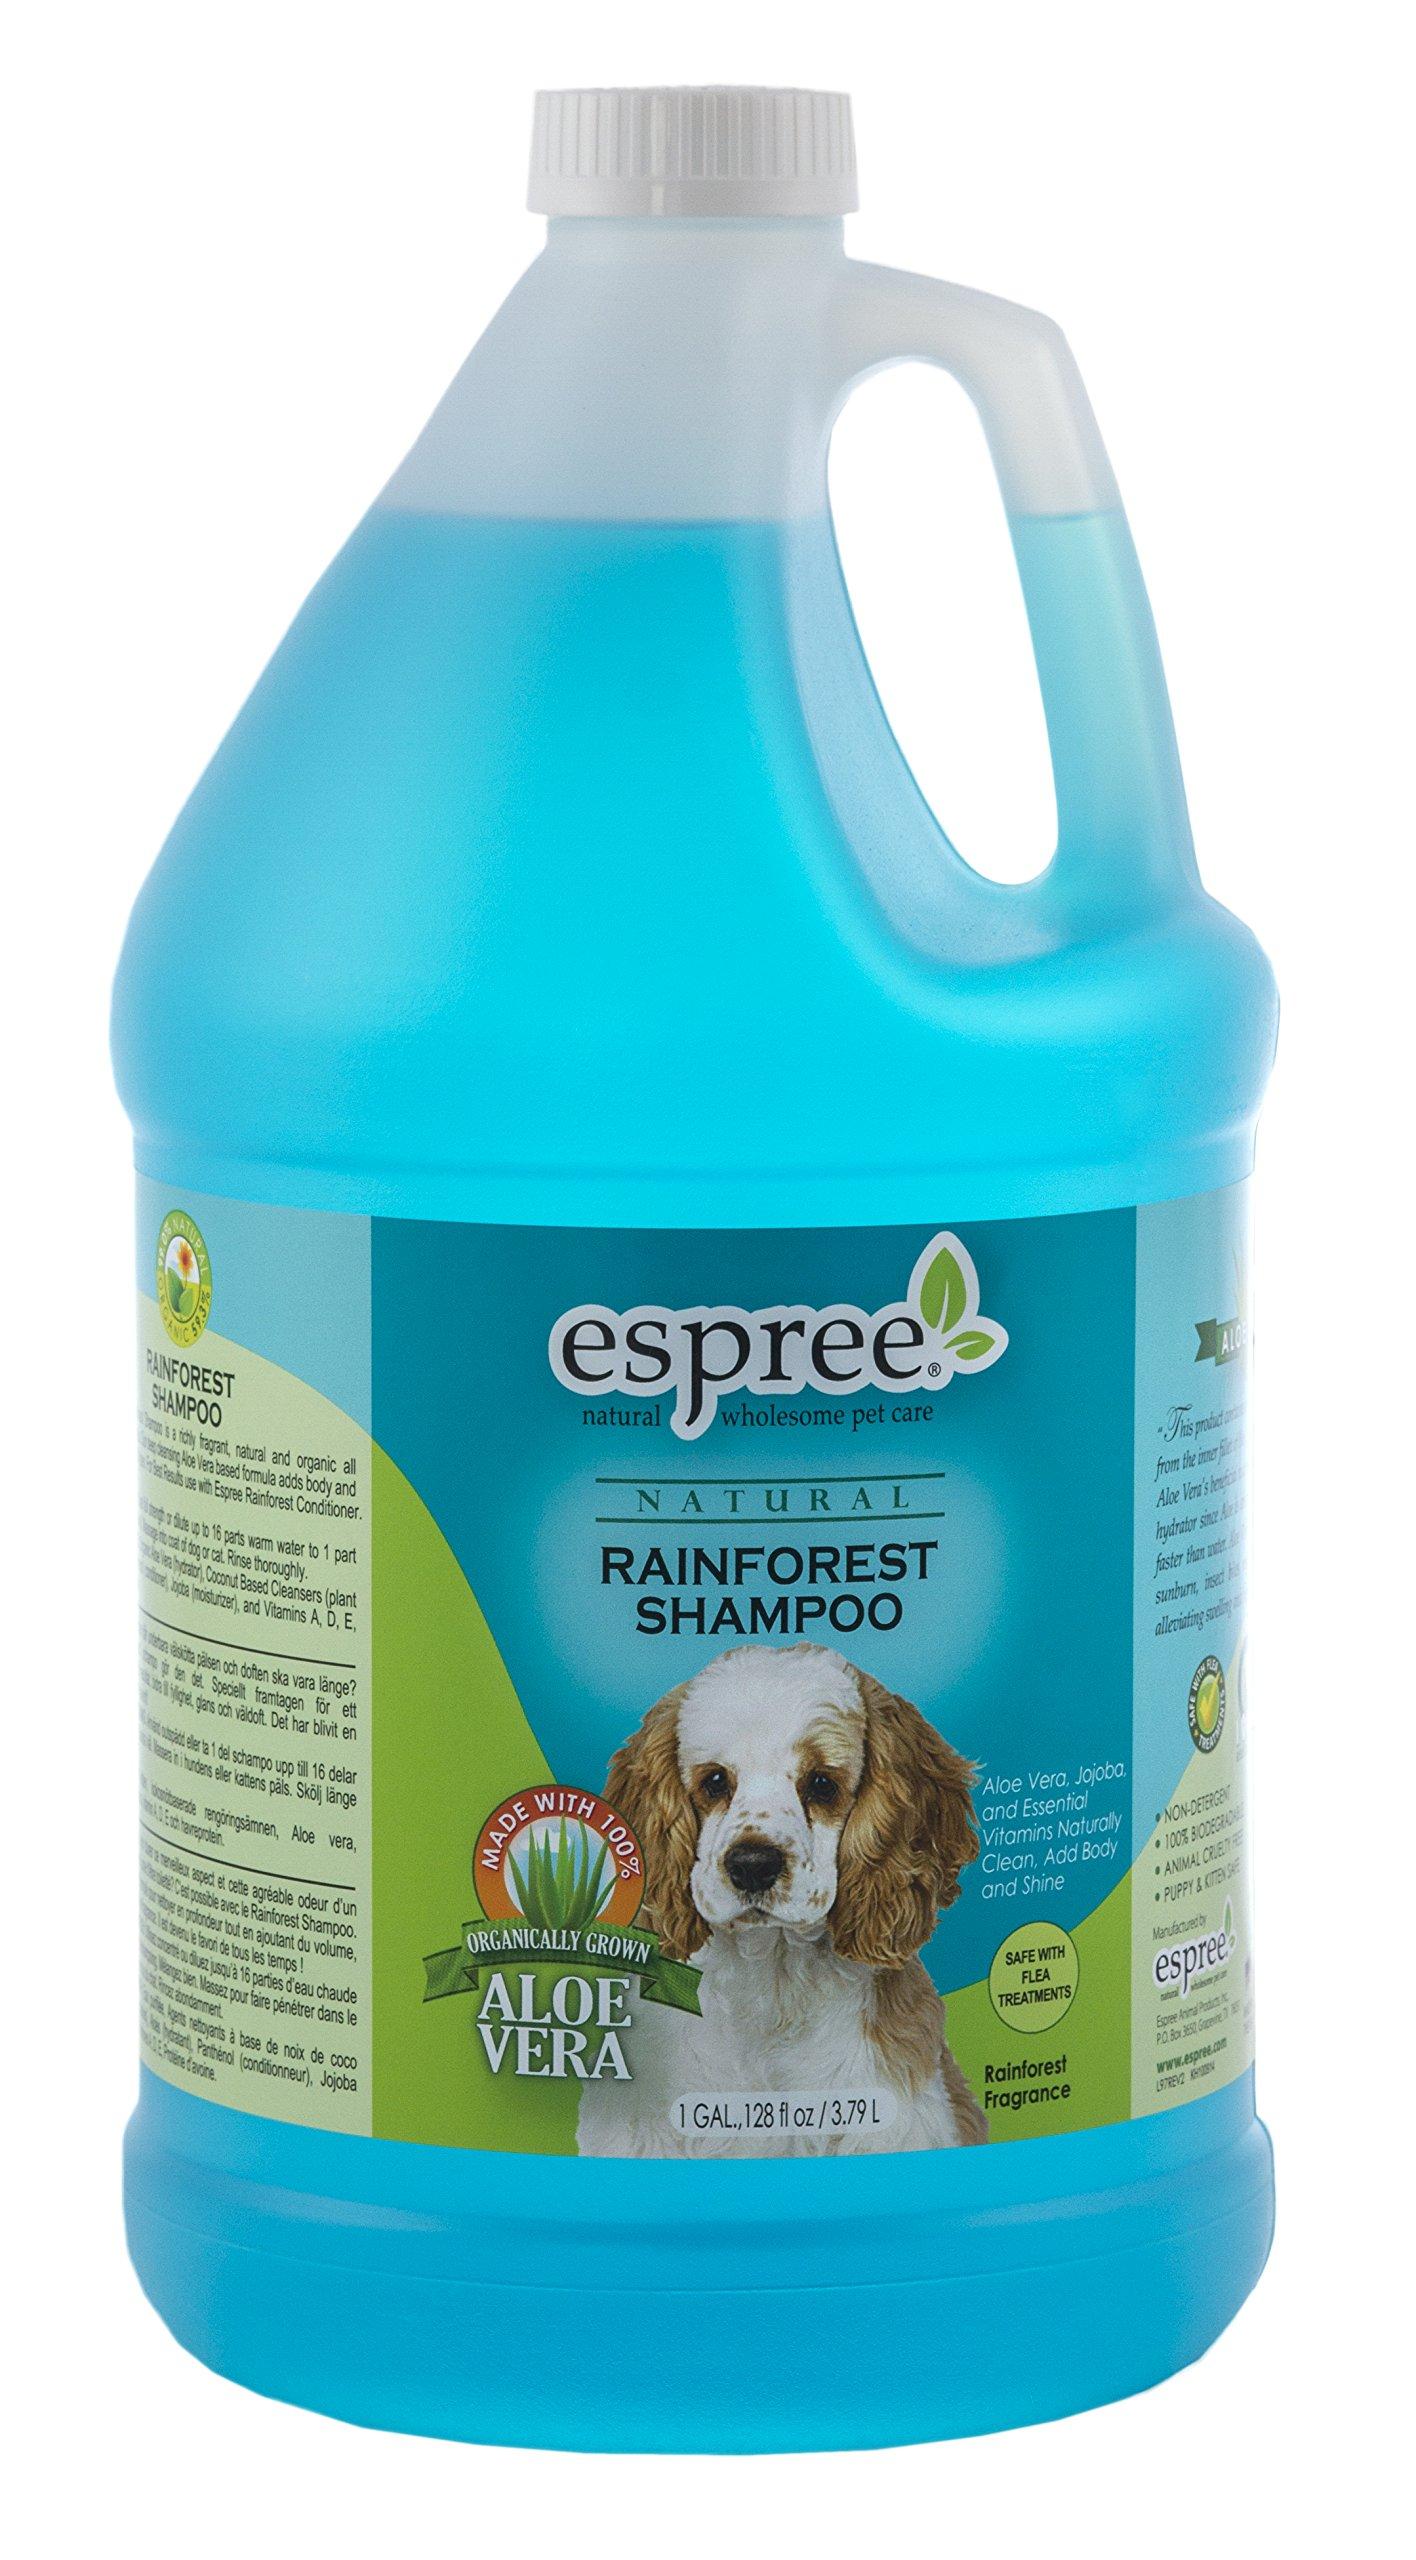 Espree Rainforest Shampoo, 1 gallon